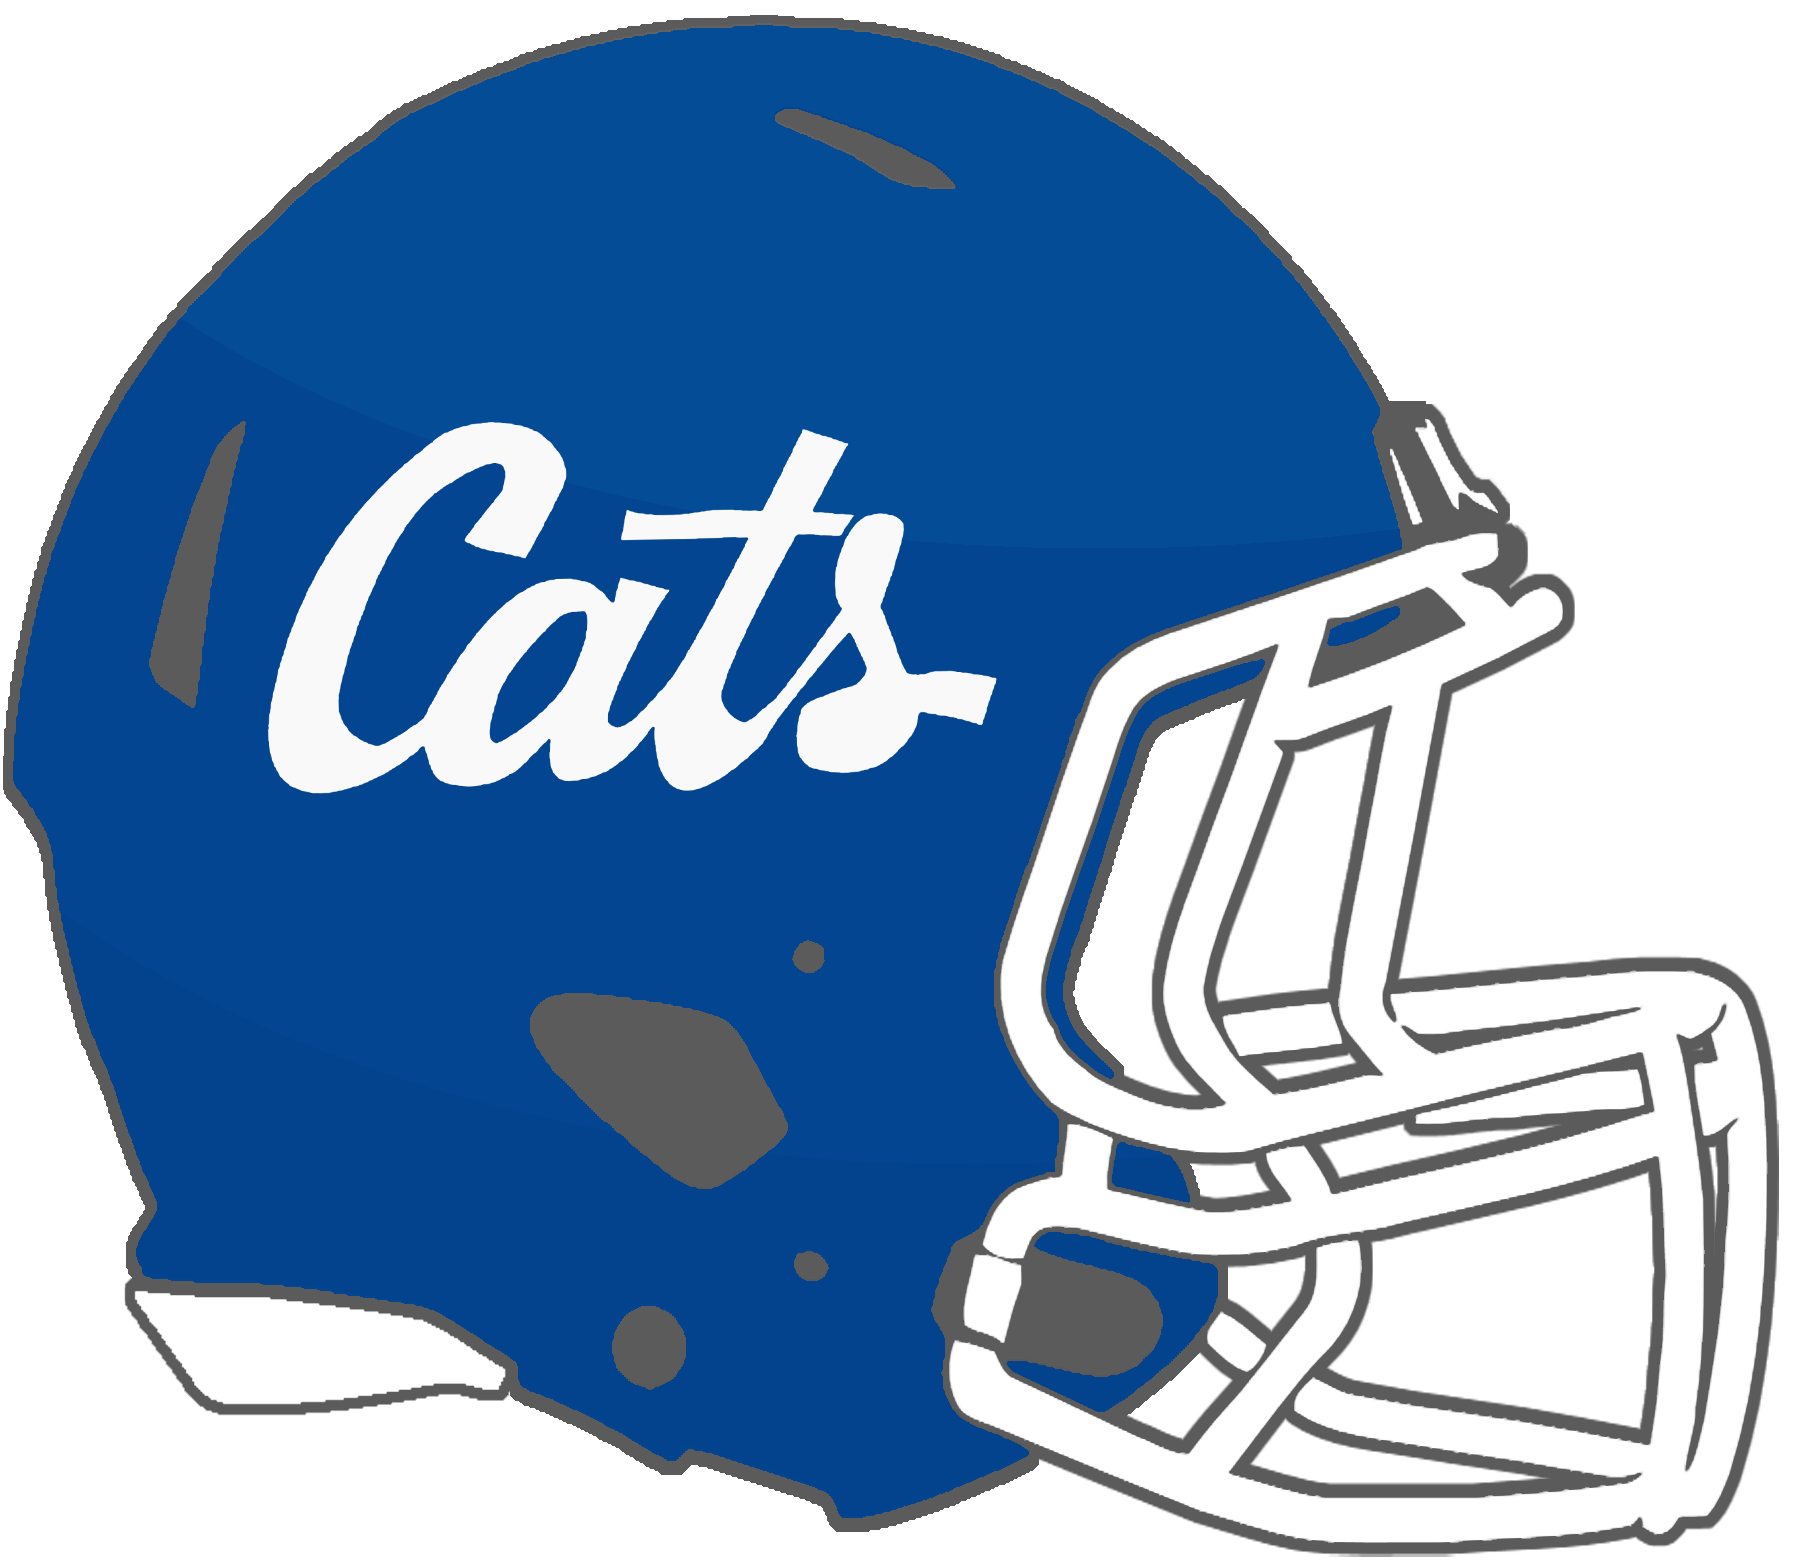 Wildcat clipart meridian. Mississippi high school football